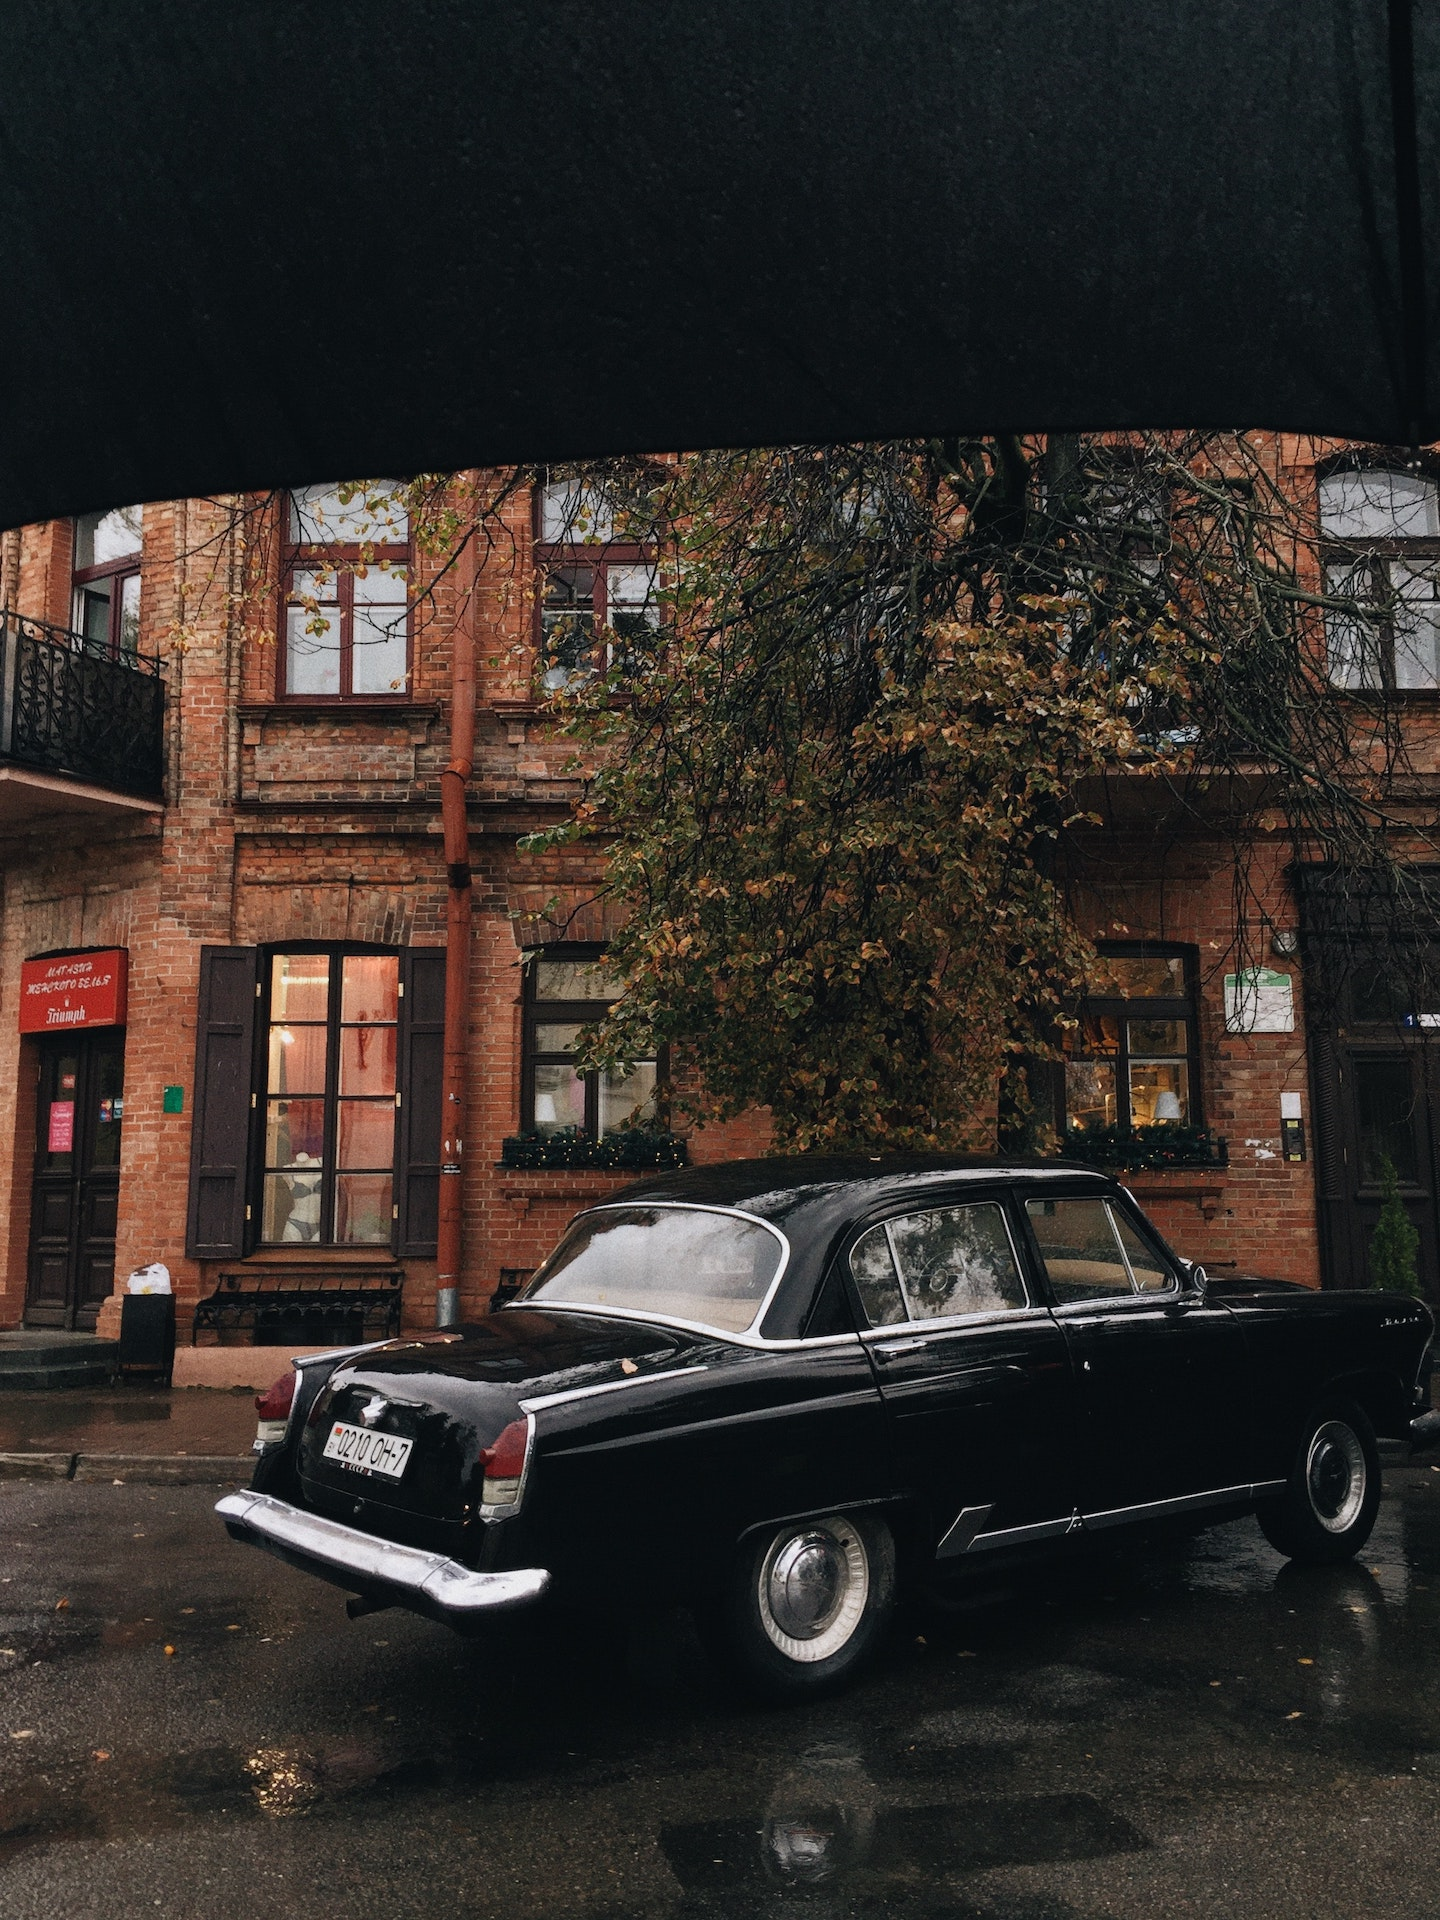 Photo: Lina Kivaka, YFS Magazine, Pexels